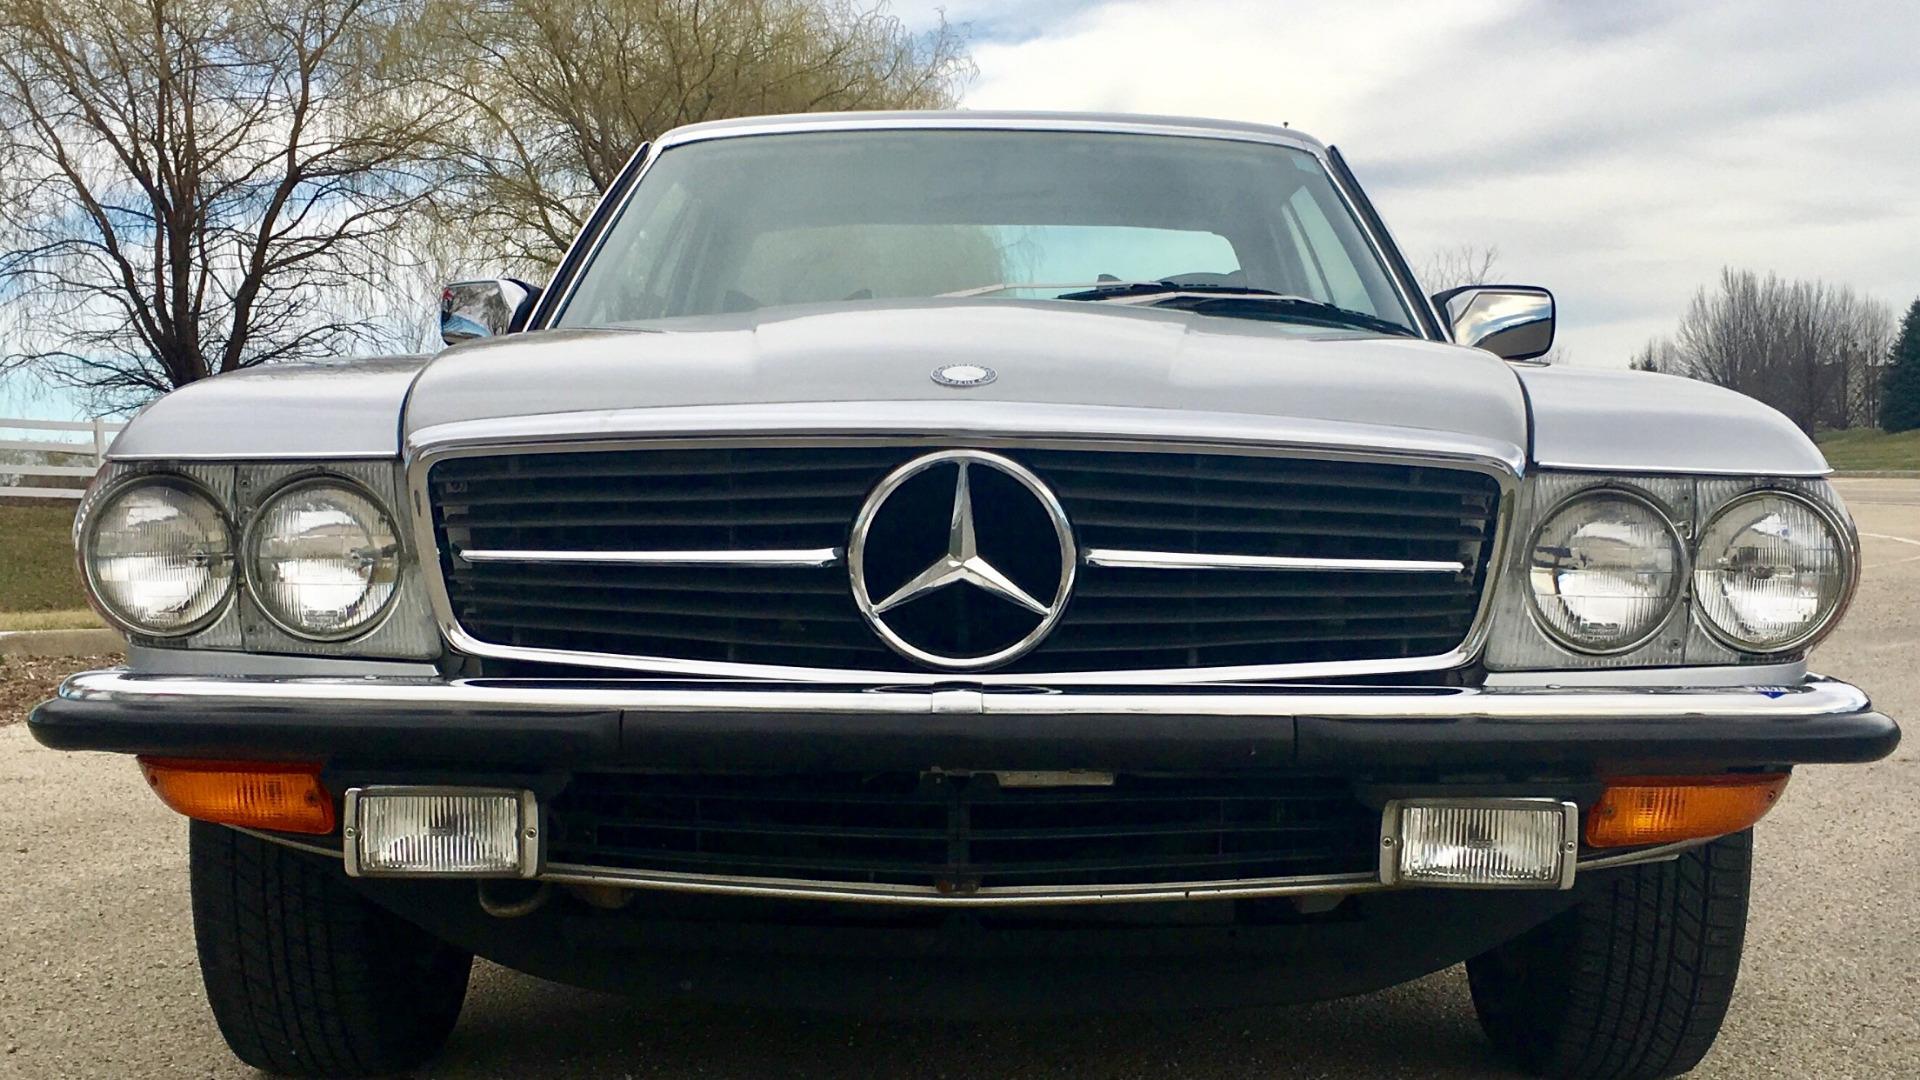 Used 1979 Mercedes Benz 280SLC Euro -RARE EURO MODEL-ORIGINAL SURVIVOR-FAMILY OWNED SINCE NEW- | Mundelein, IL